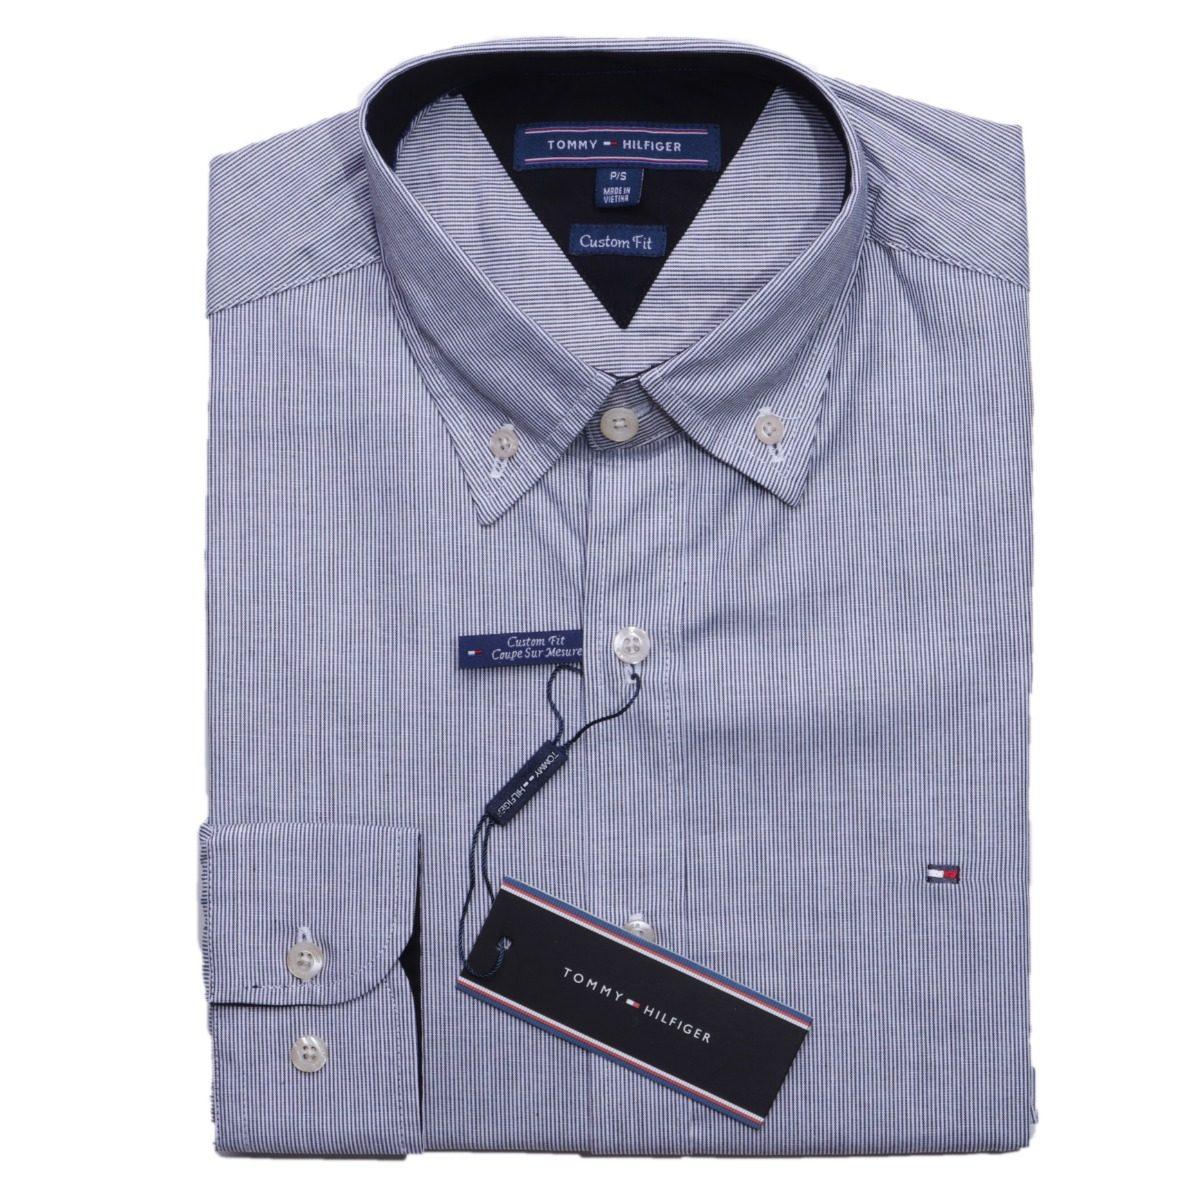 e77cb27dd5 Camisa social tommy hilfiger fit listrada preto original carregando zoom  jpg 1200x1200 Camisa social listrada tommy